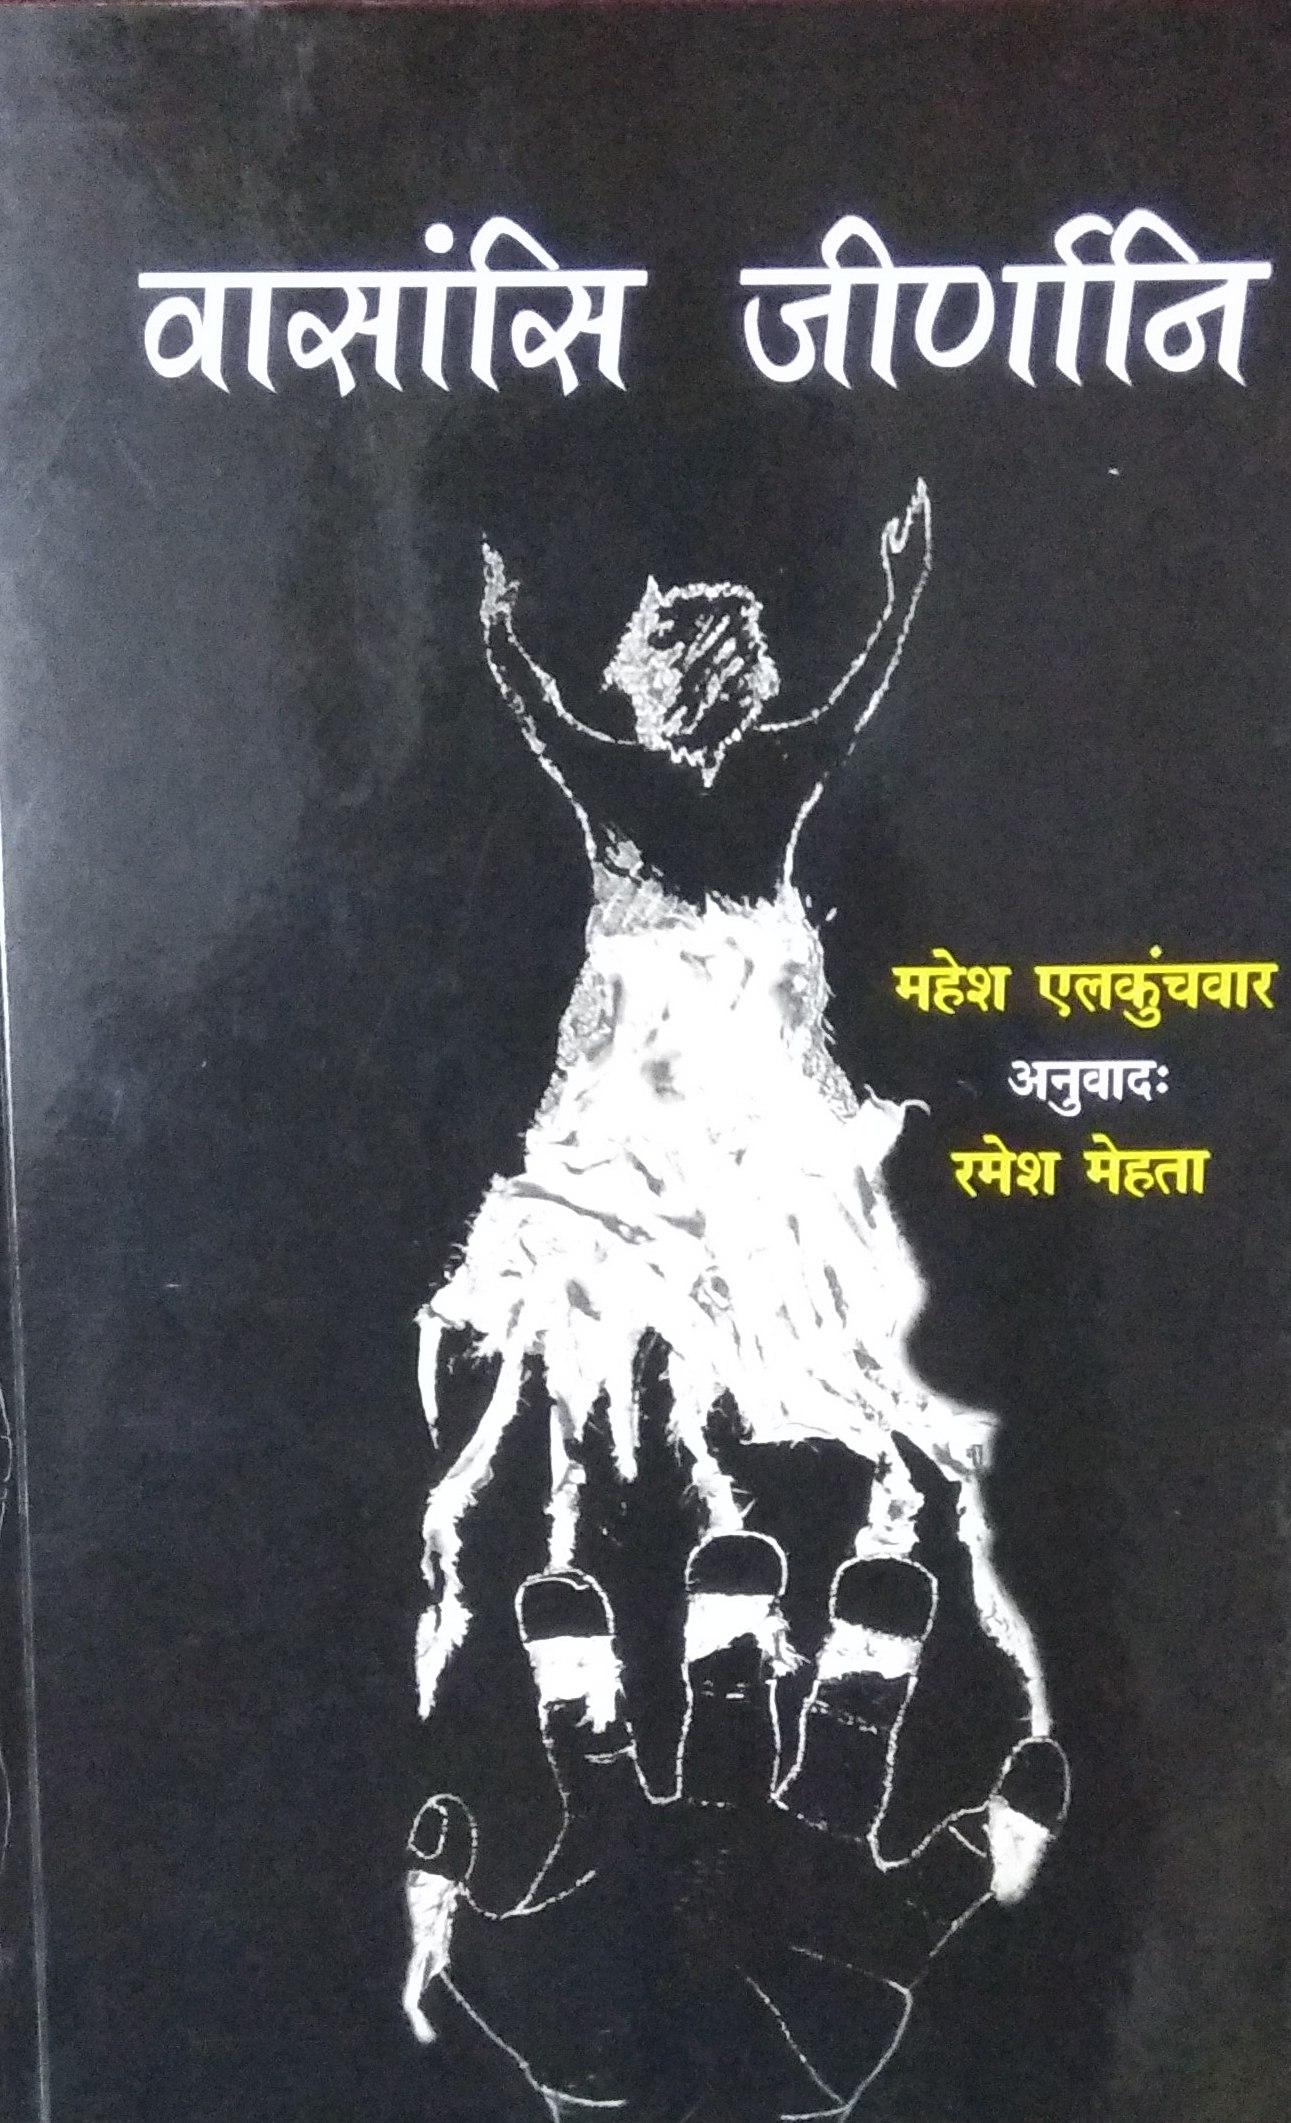 Vasansee Jirnanee (Hindi)